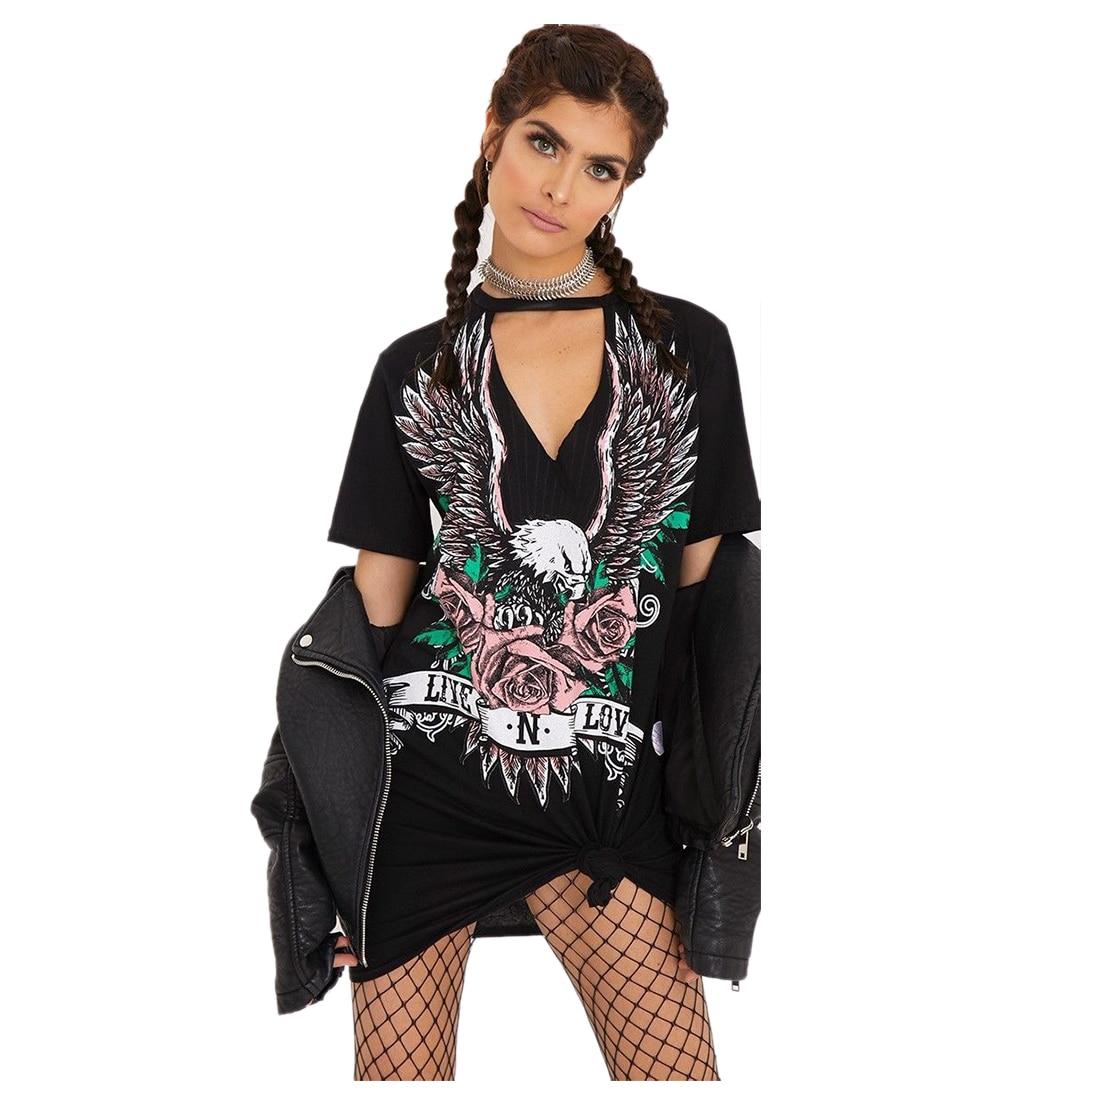 f7b4a254d18a TFGS Women's New Fashion Sexy V Neck Dress Print Punk Rock Rose Eagle  Halter T Shirt Dress Short Sleeve Casual Loose Summer Mi